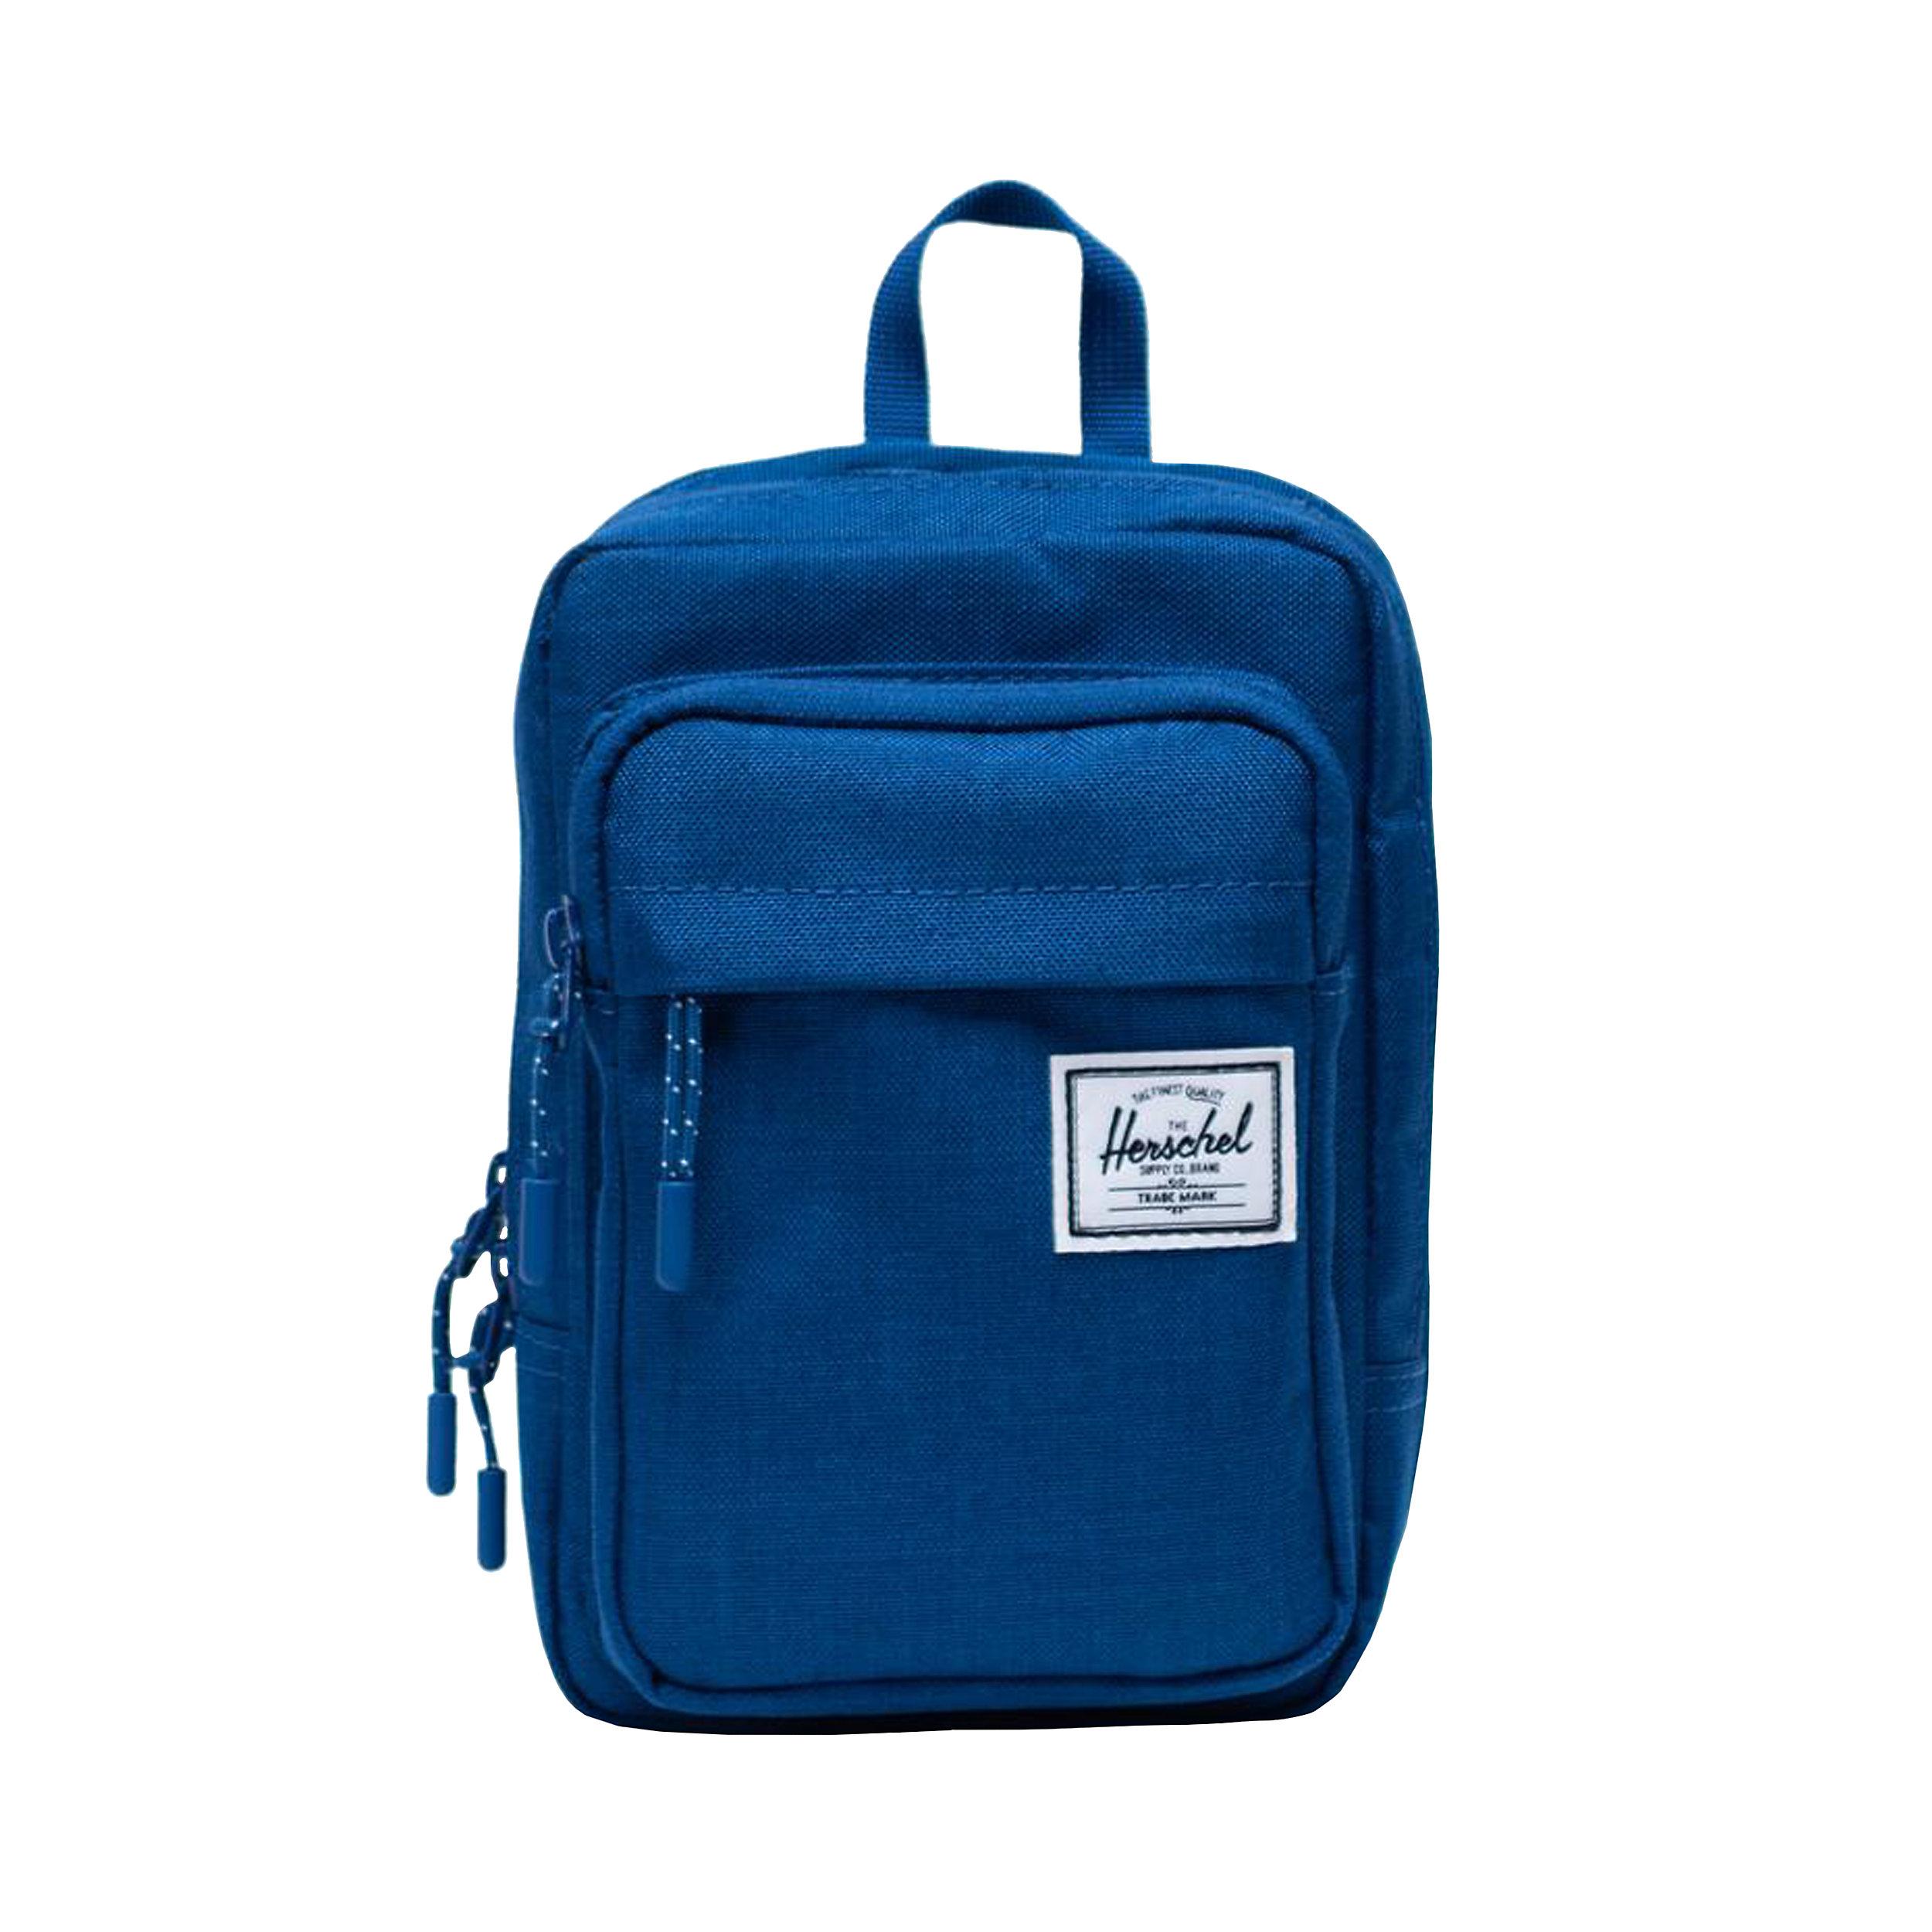 Crossbody Bag Form Large Classics 2 Liter